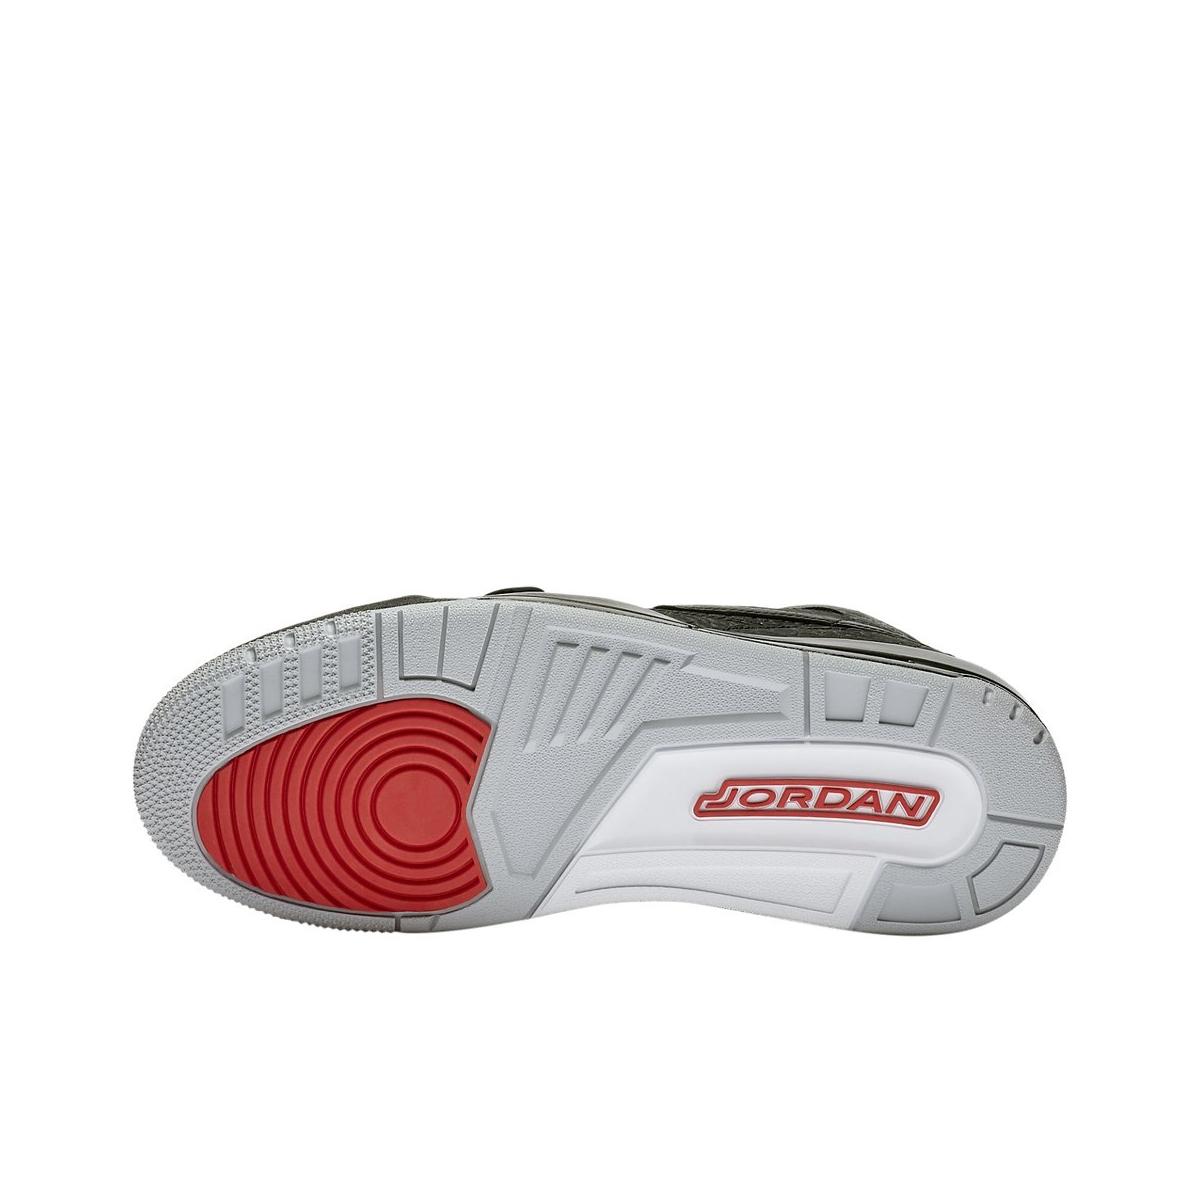 Nike Air Jordan Legacy 312 AV3922 006